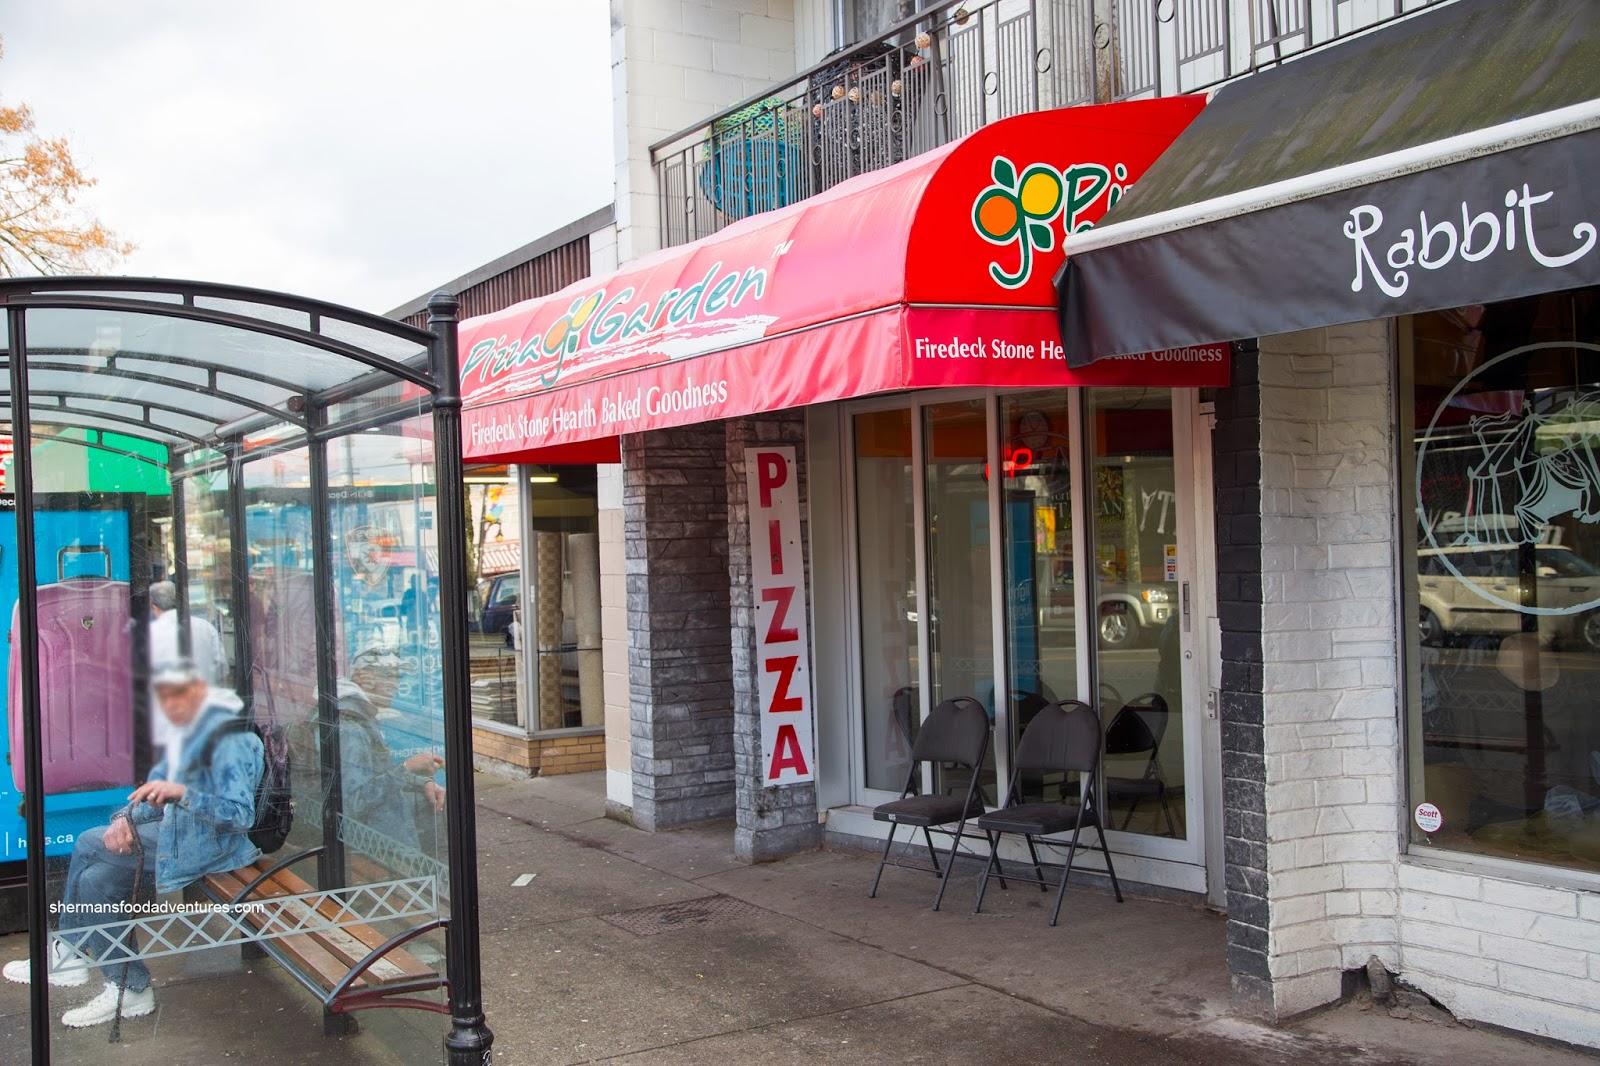 Sherman 39 s food adventures pizza garden commercial Garden city pizza